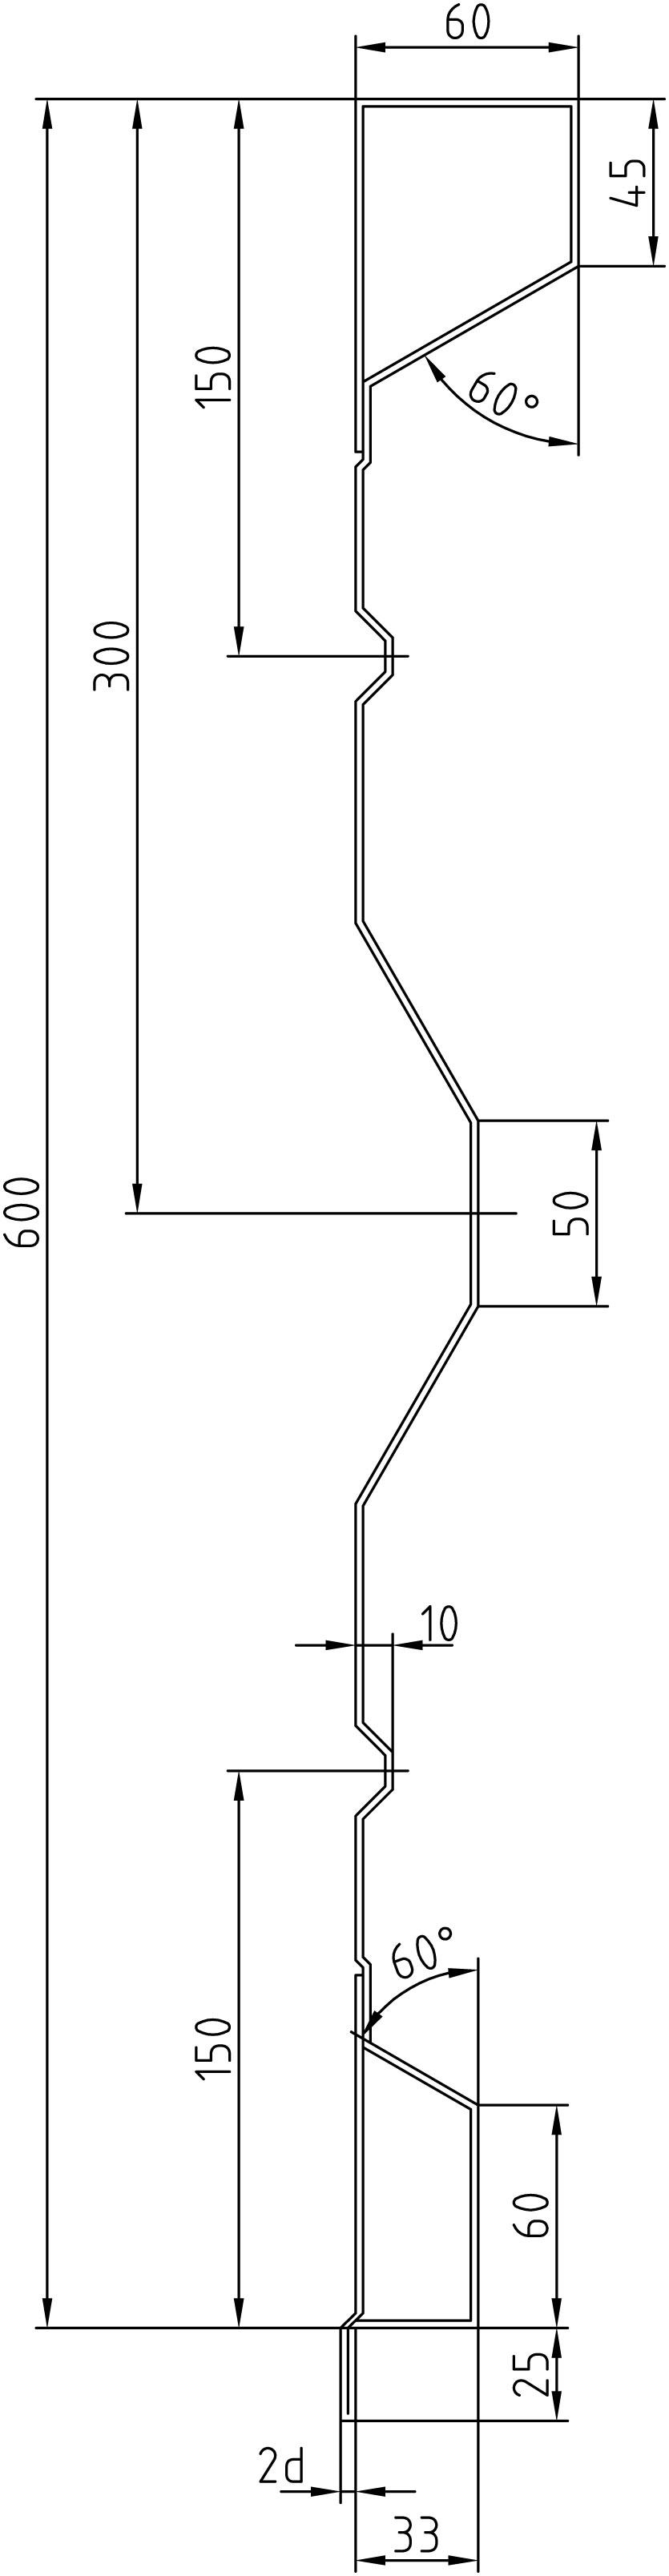 Brantner Kipper und Anhänger - 600x2x3940 AW samt EL o. PW- Bolzen links